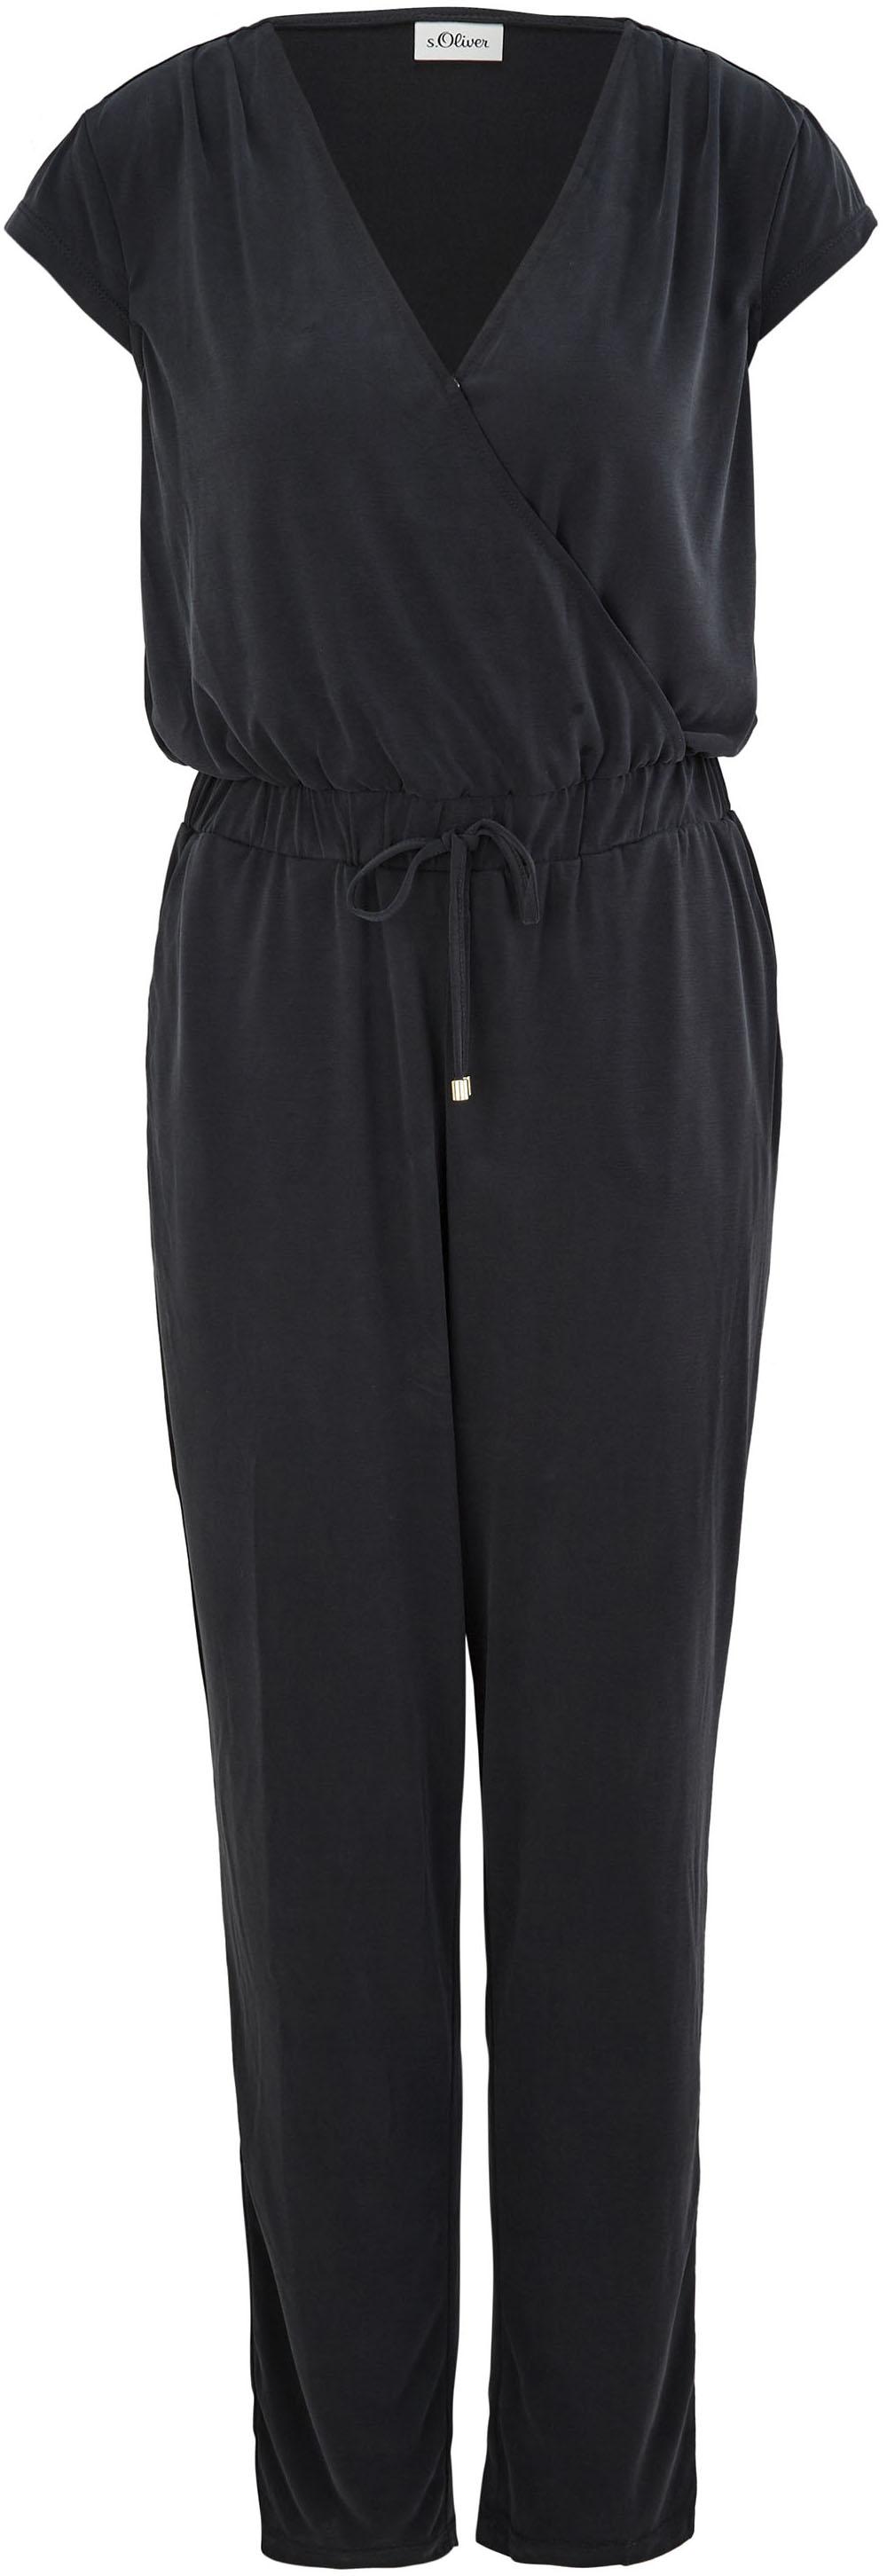 s.oliver black label -  Jumpsuit, mit Cache-Coeur-Ausschnitt